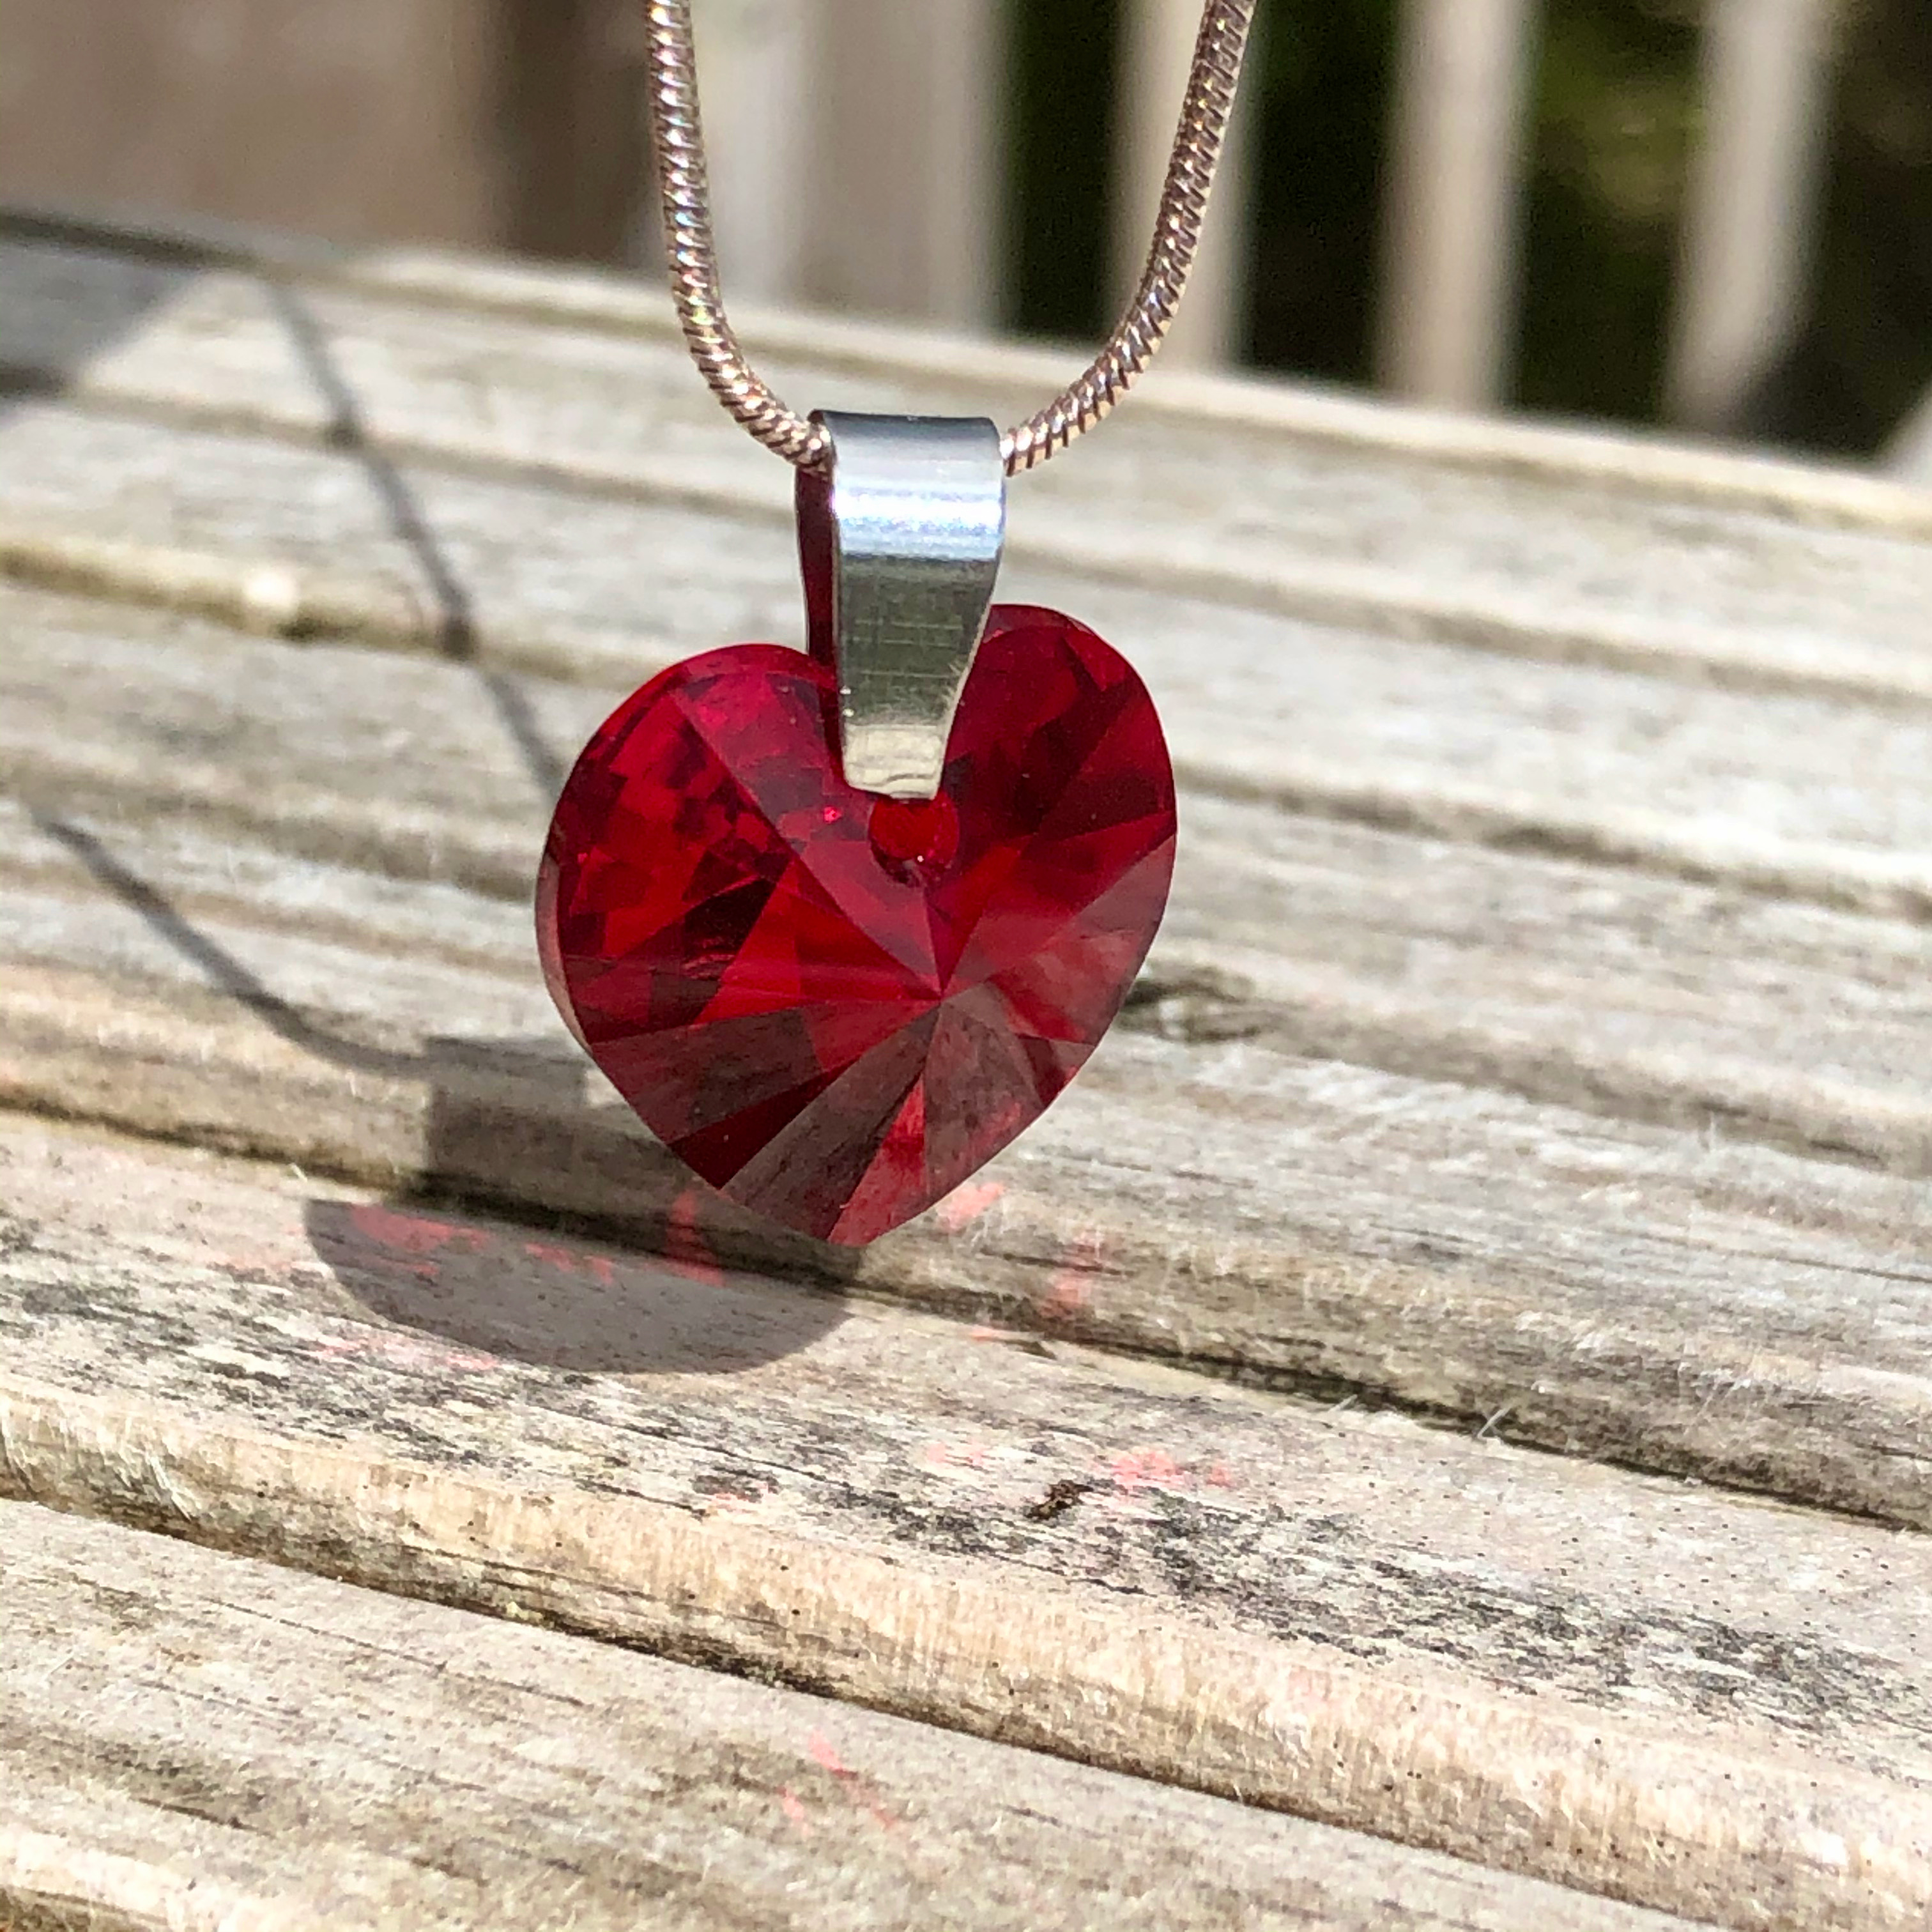 Necklace: Swarovski Heart 18mm Red SALE 10% (£16)